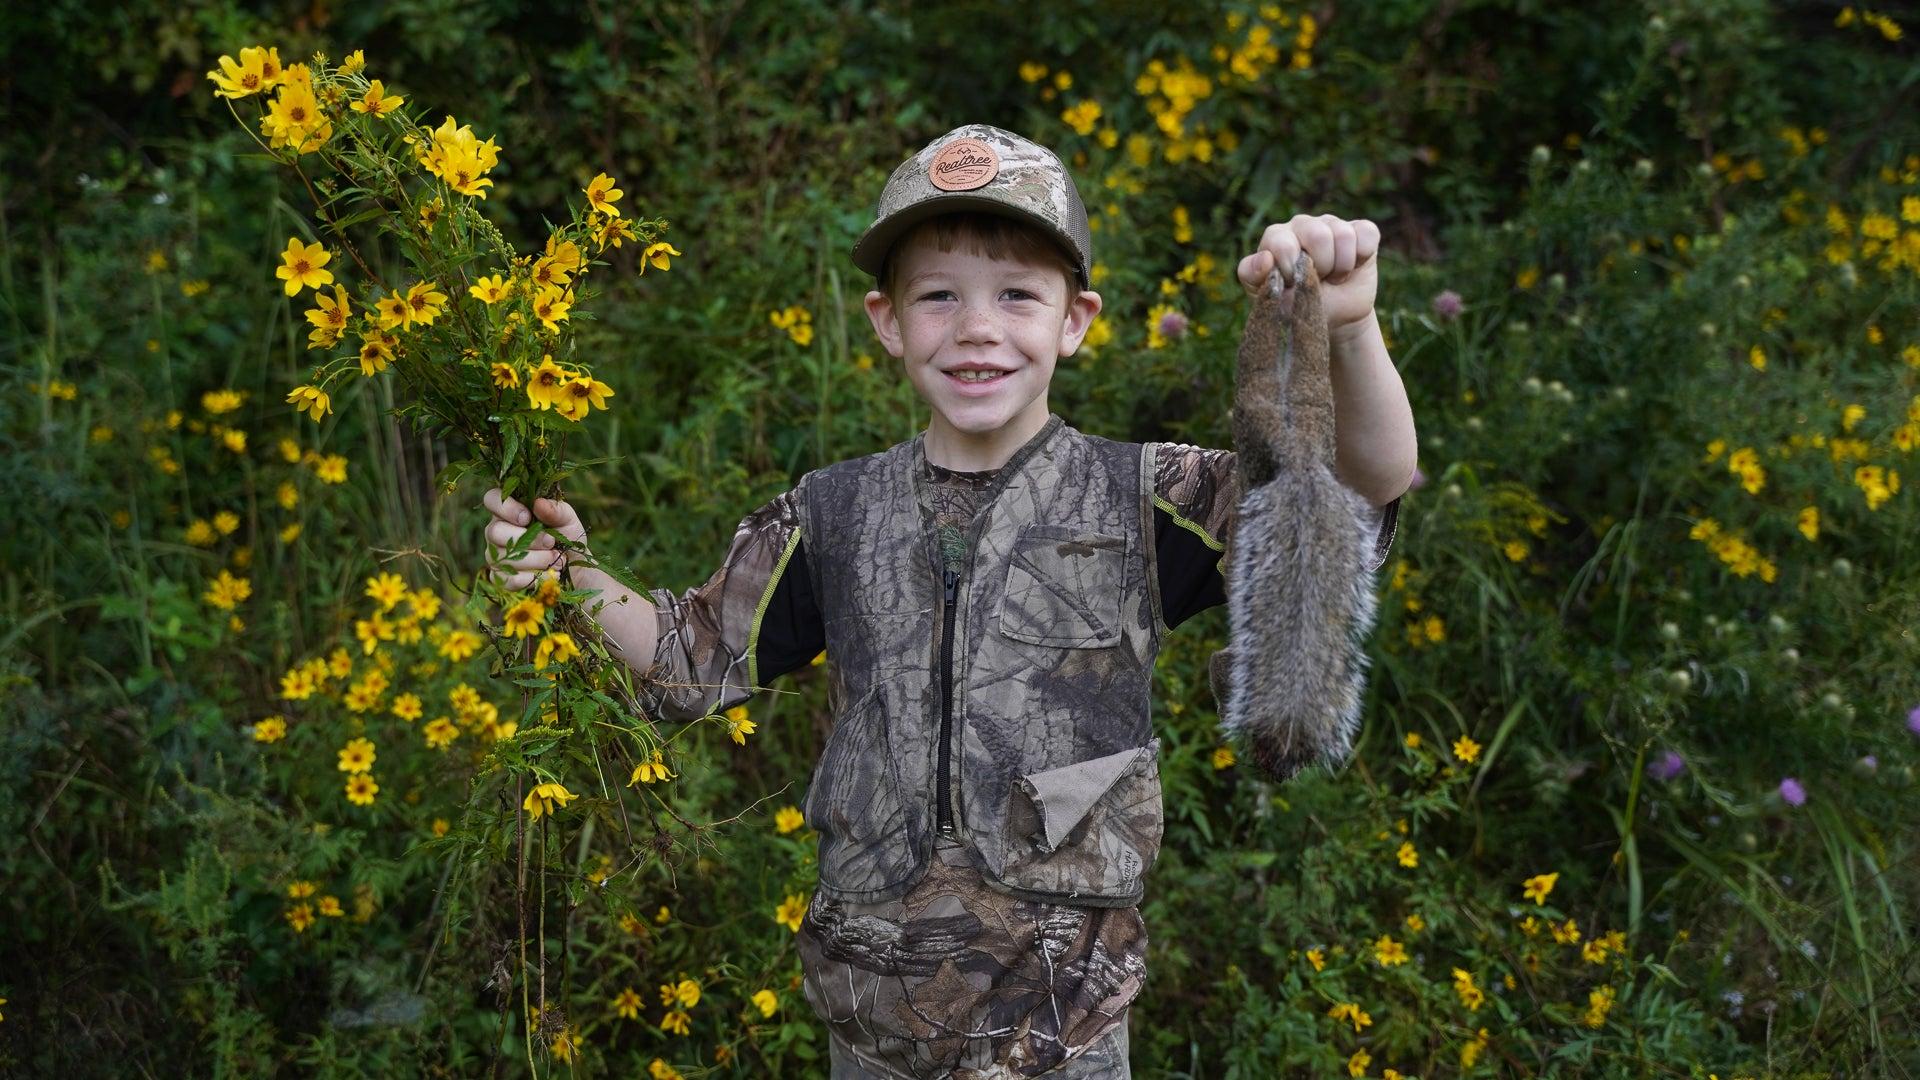 Take advantage of spring squirrel hunting seasons.